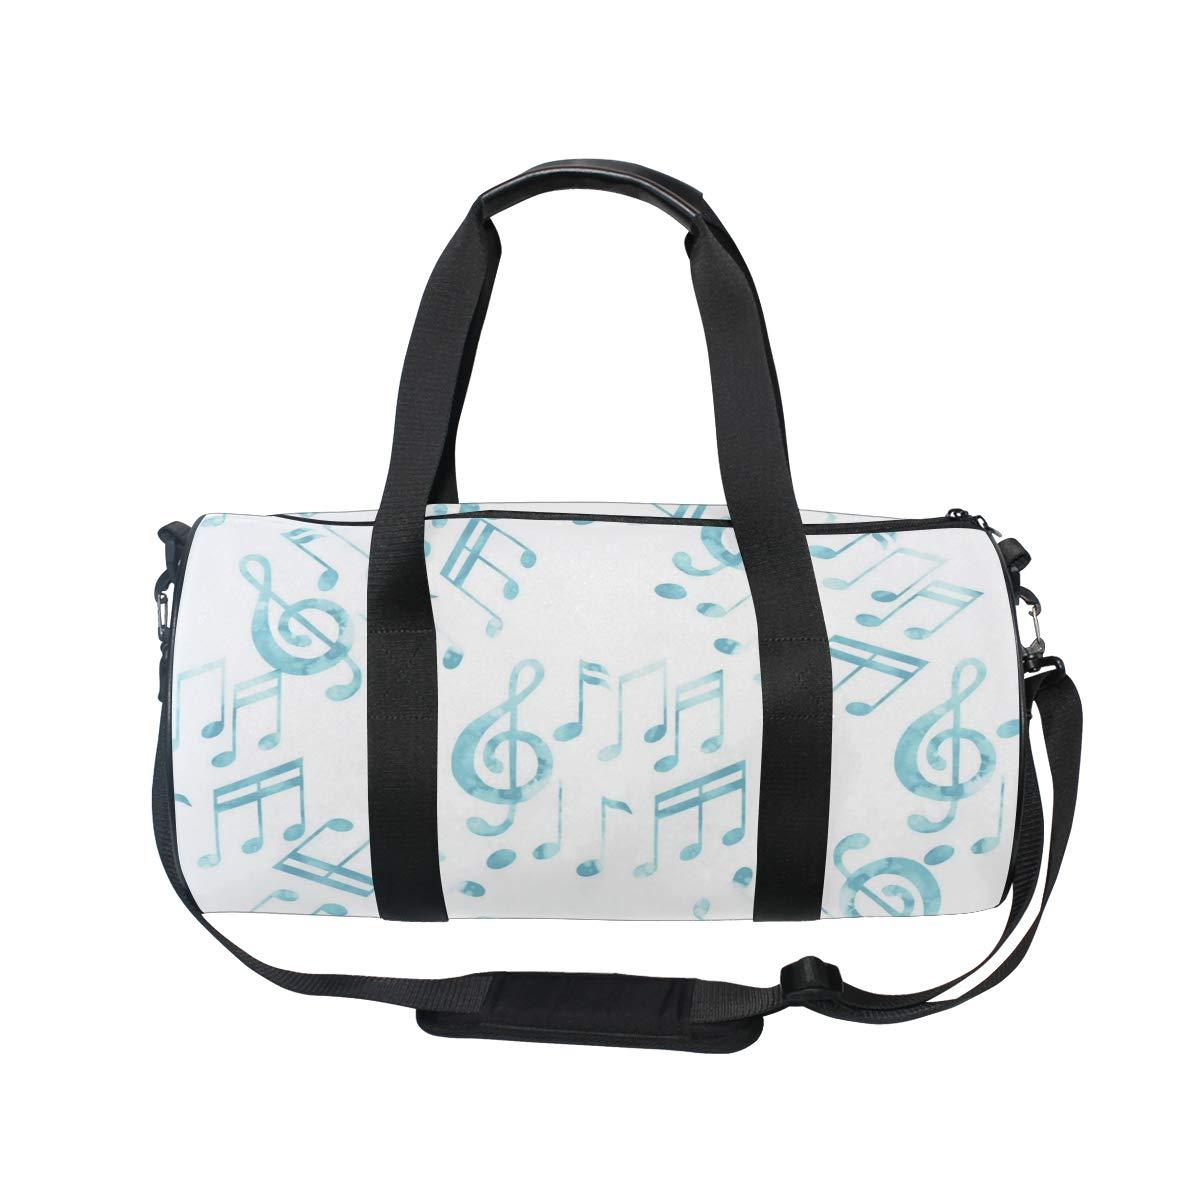 Blue Music Keyboard ImageWaterproof Non-Slip Wearable Crossbody Bag fitness bag Shoulder Bag